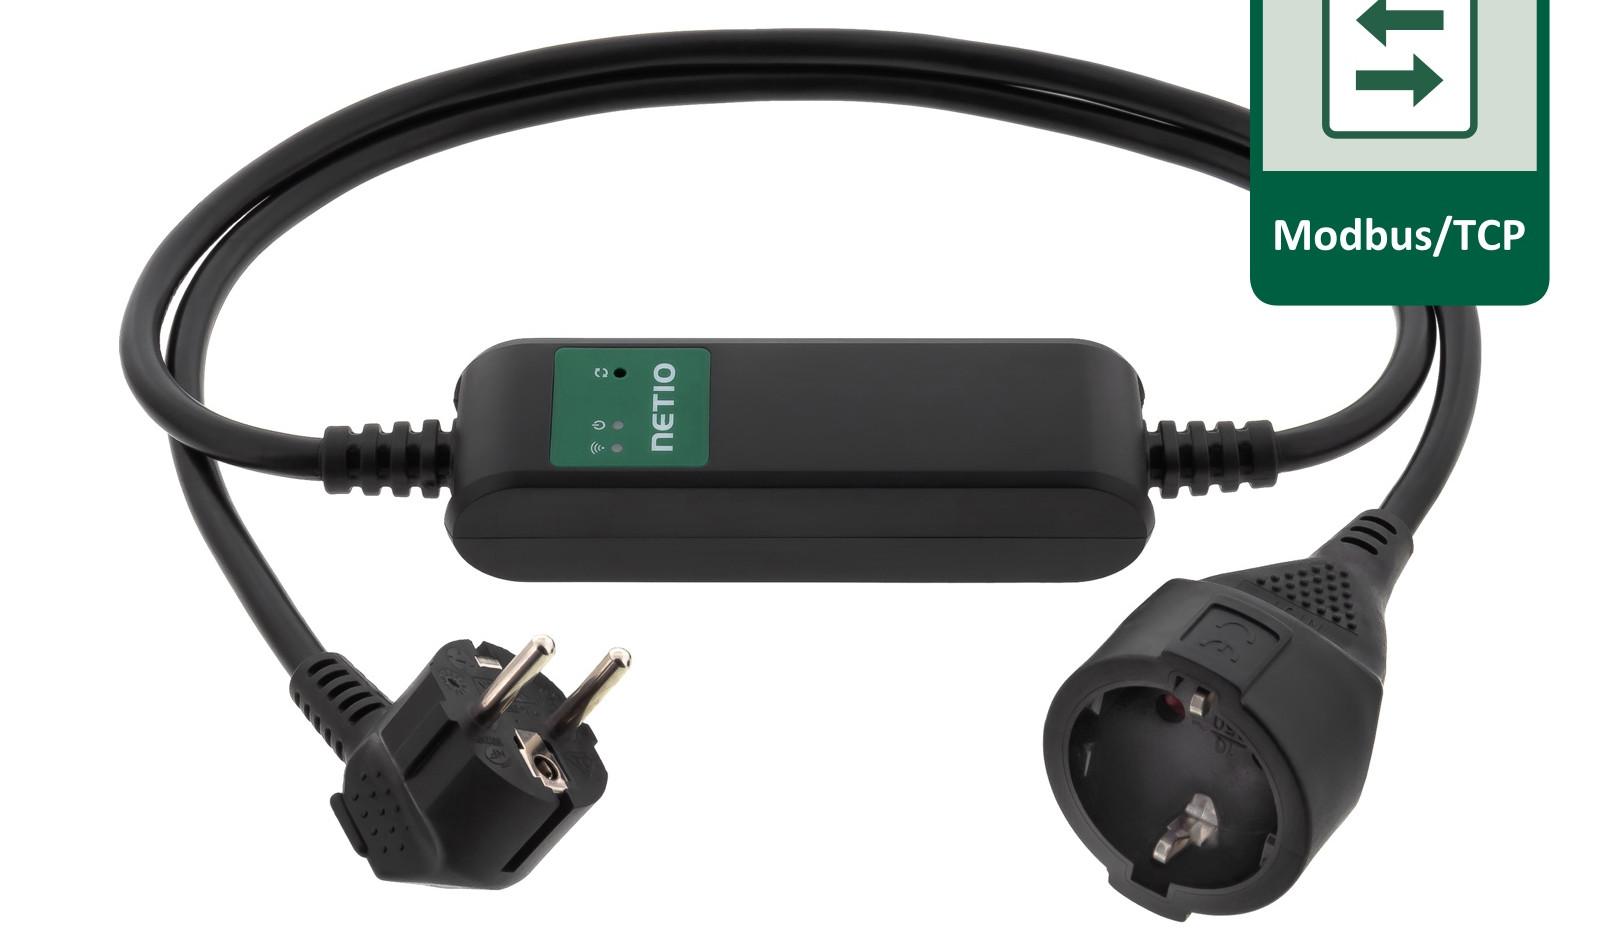 PowerCable-Modbus-101F_DE-schuko-power-s